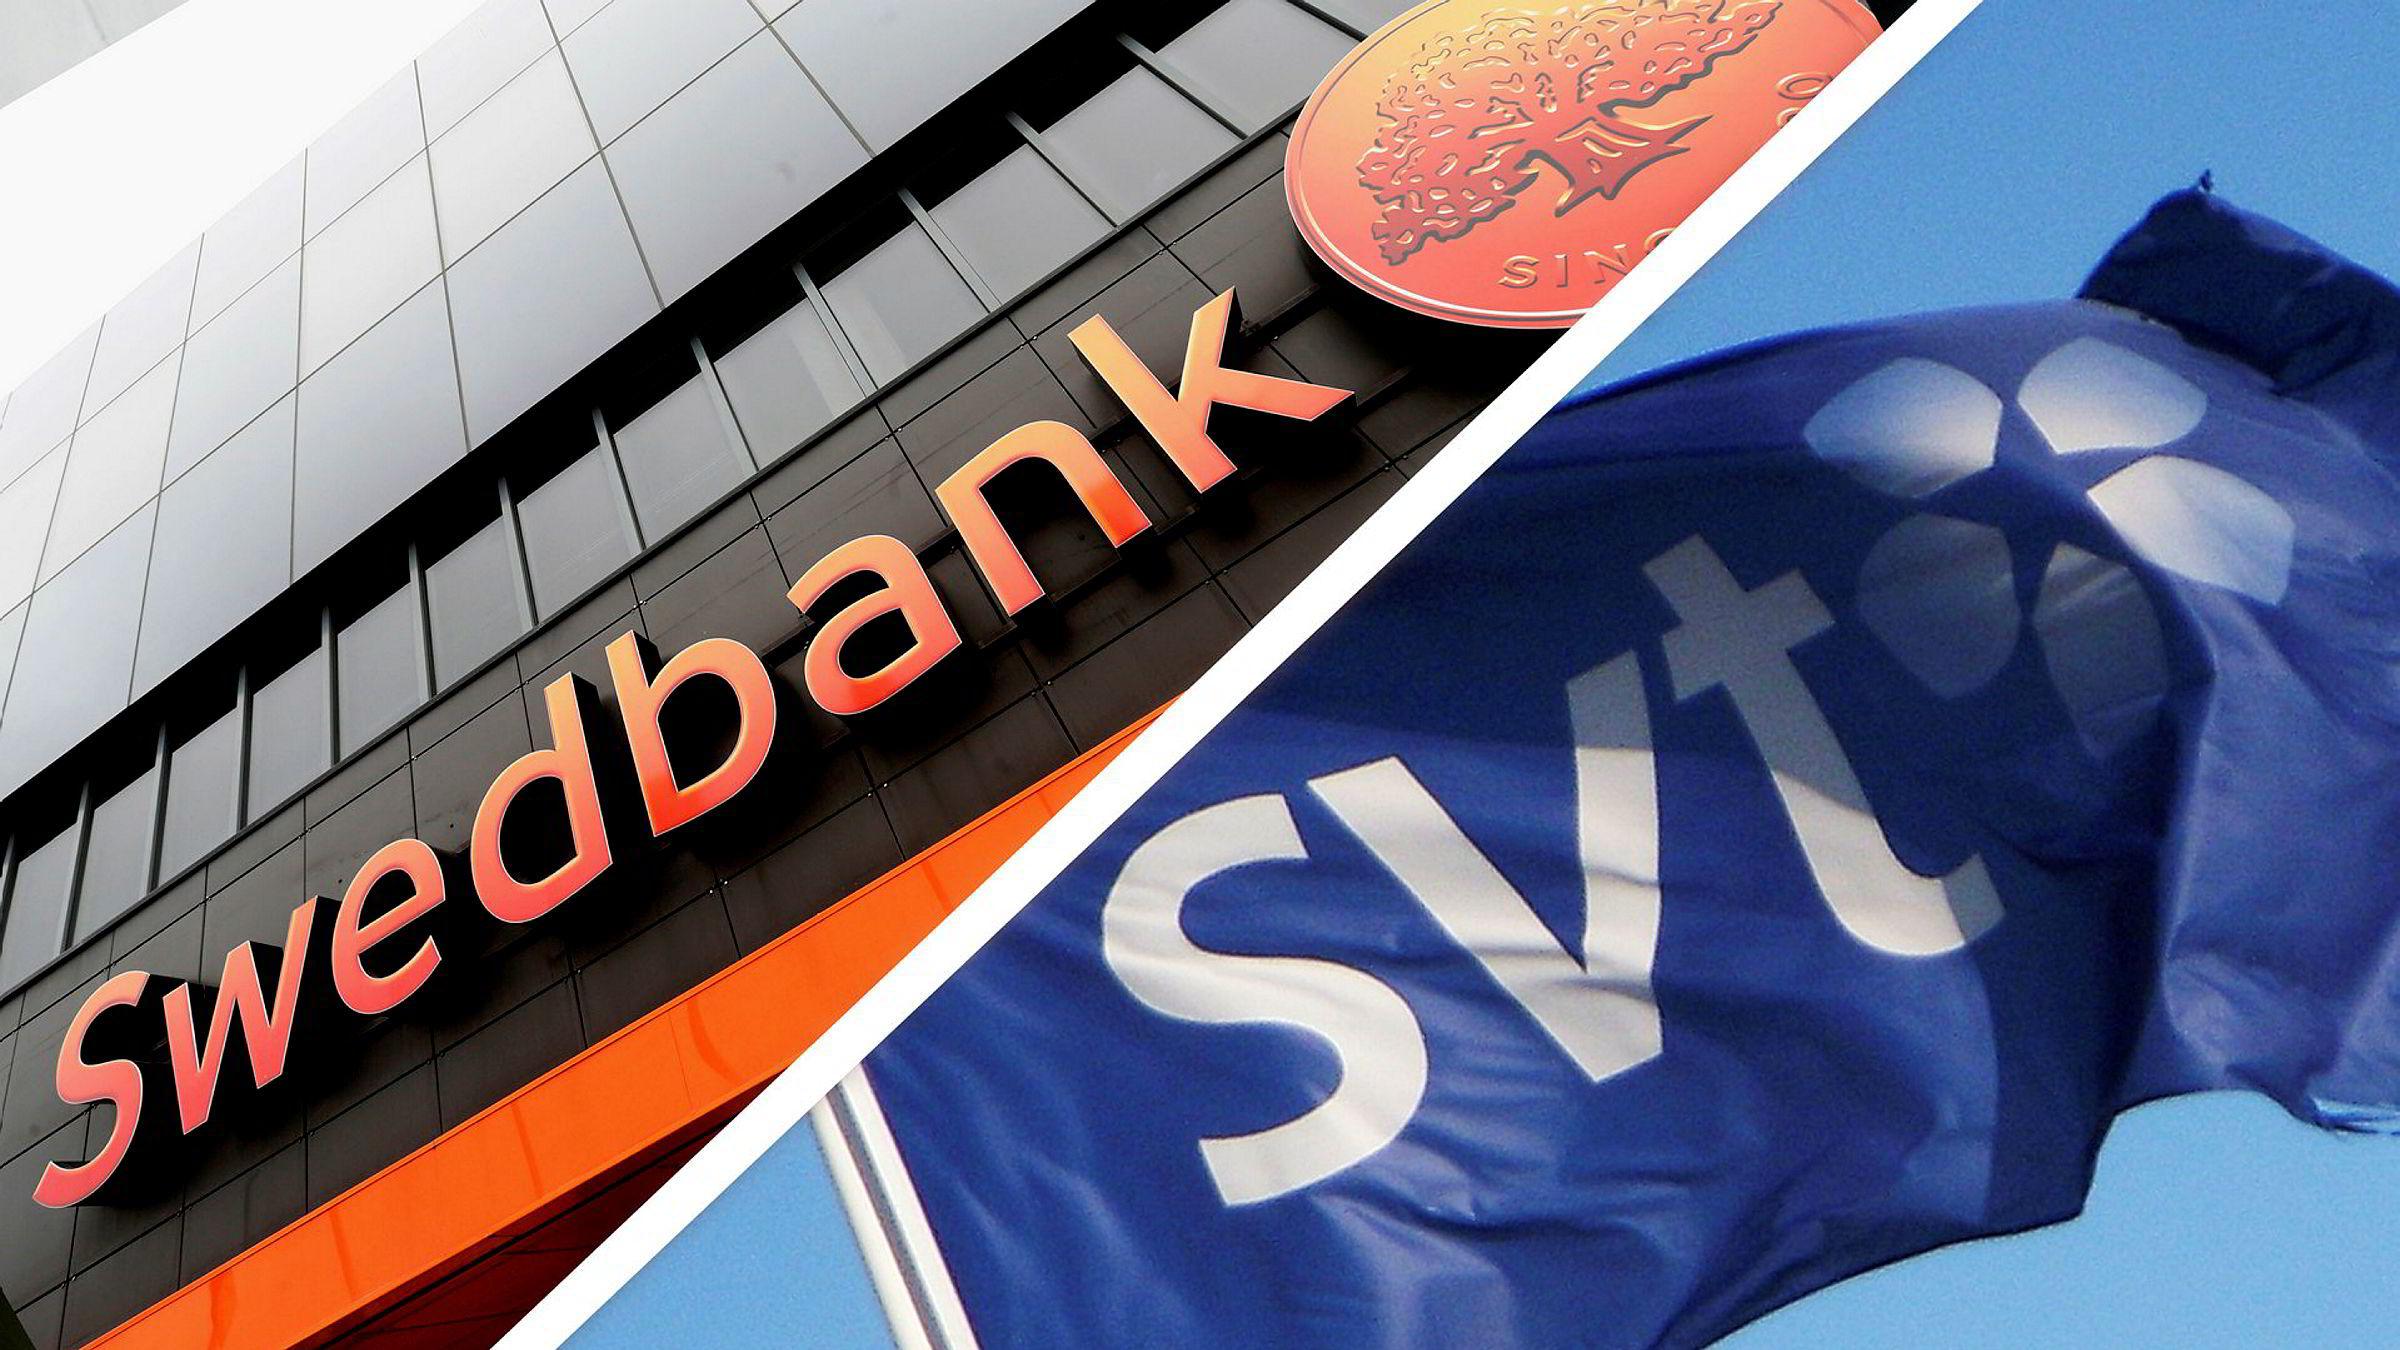 Swedbank.